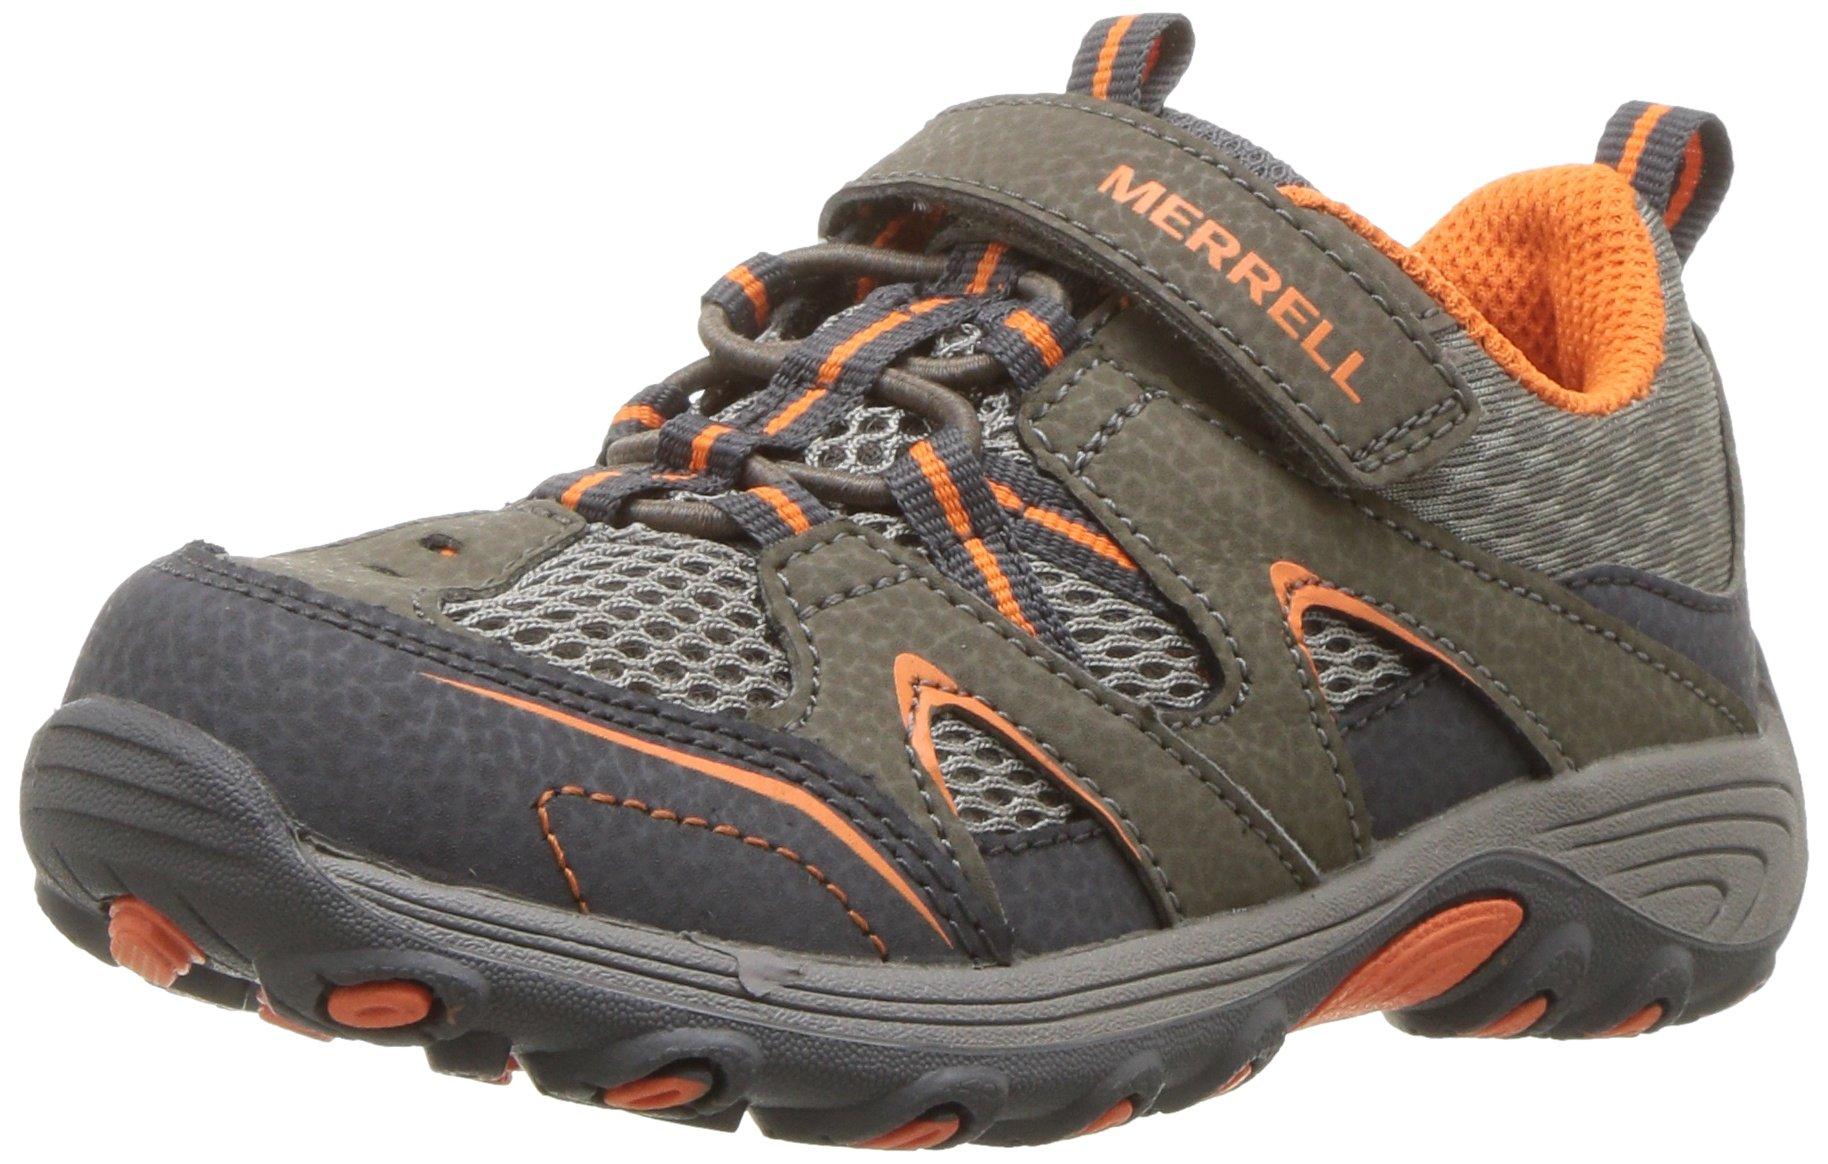 Merrell Boys' Trail Chaser JR Hiking Shoe, Gunsmoke, 6.5 Medium US Toddler